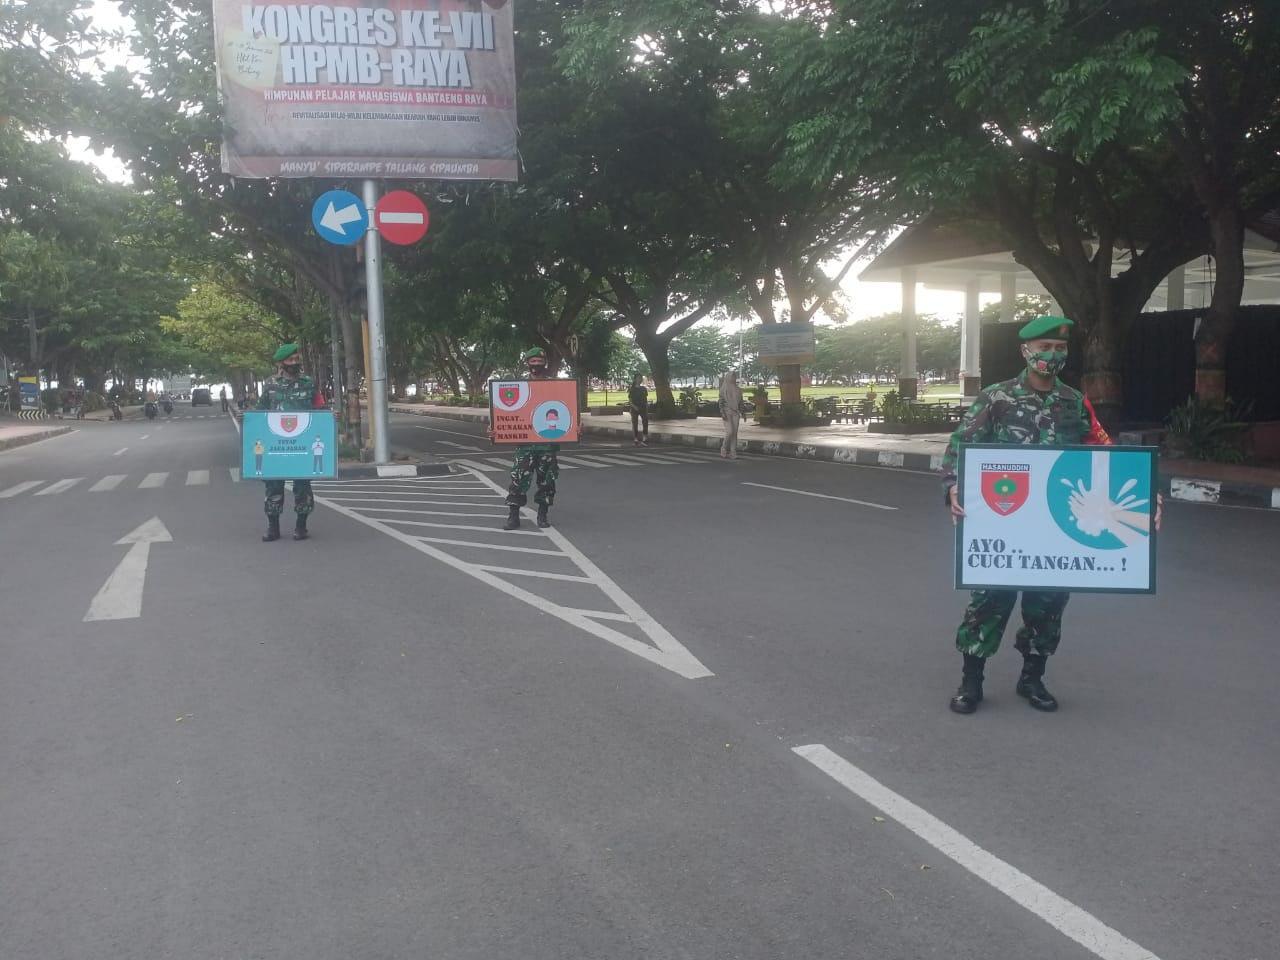 Operasi Penegakan Disiplin Protokol Kesehatan atau PDPK Kodim 1410/Bantaeng di Kawasan Pantai Seruni Bantaeng, Minggu, 31 Januari 2021. (Dok. Meleknews.ID)